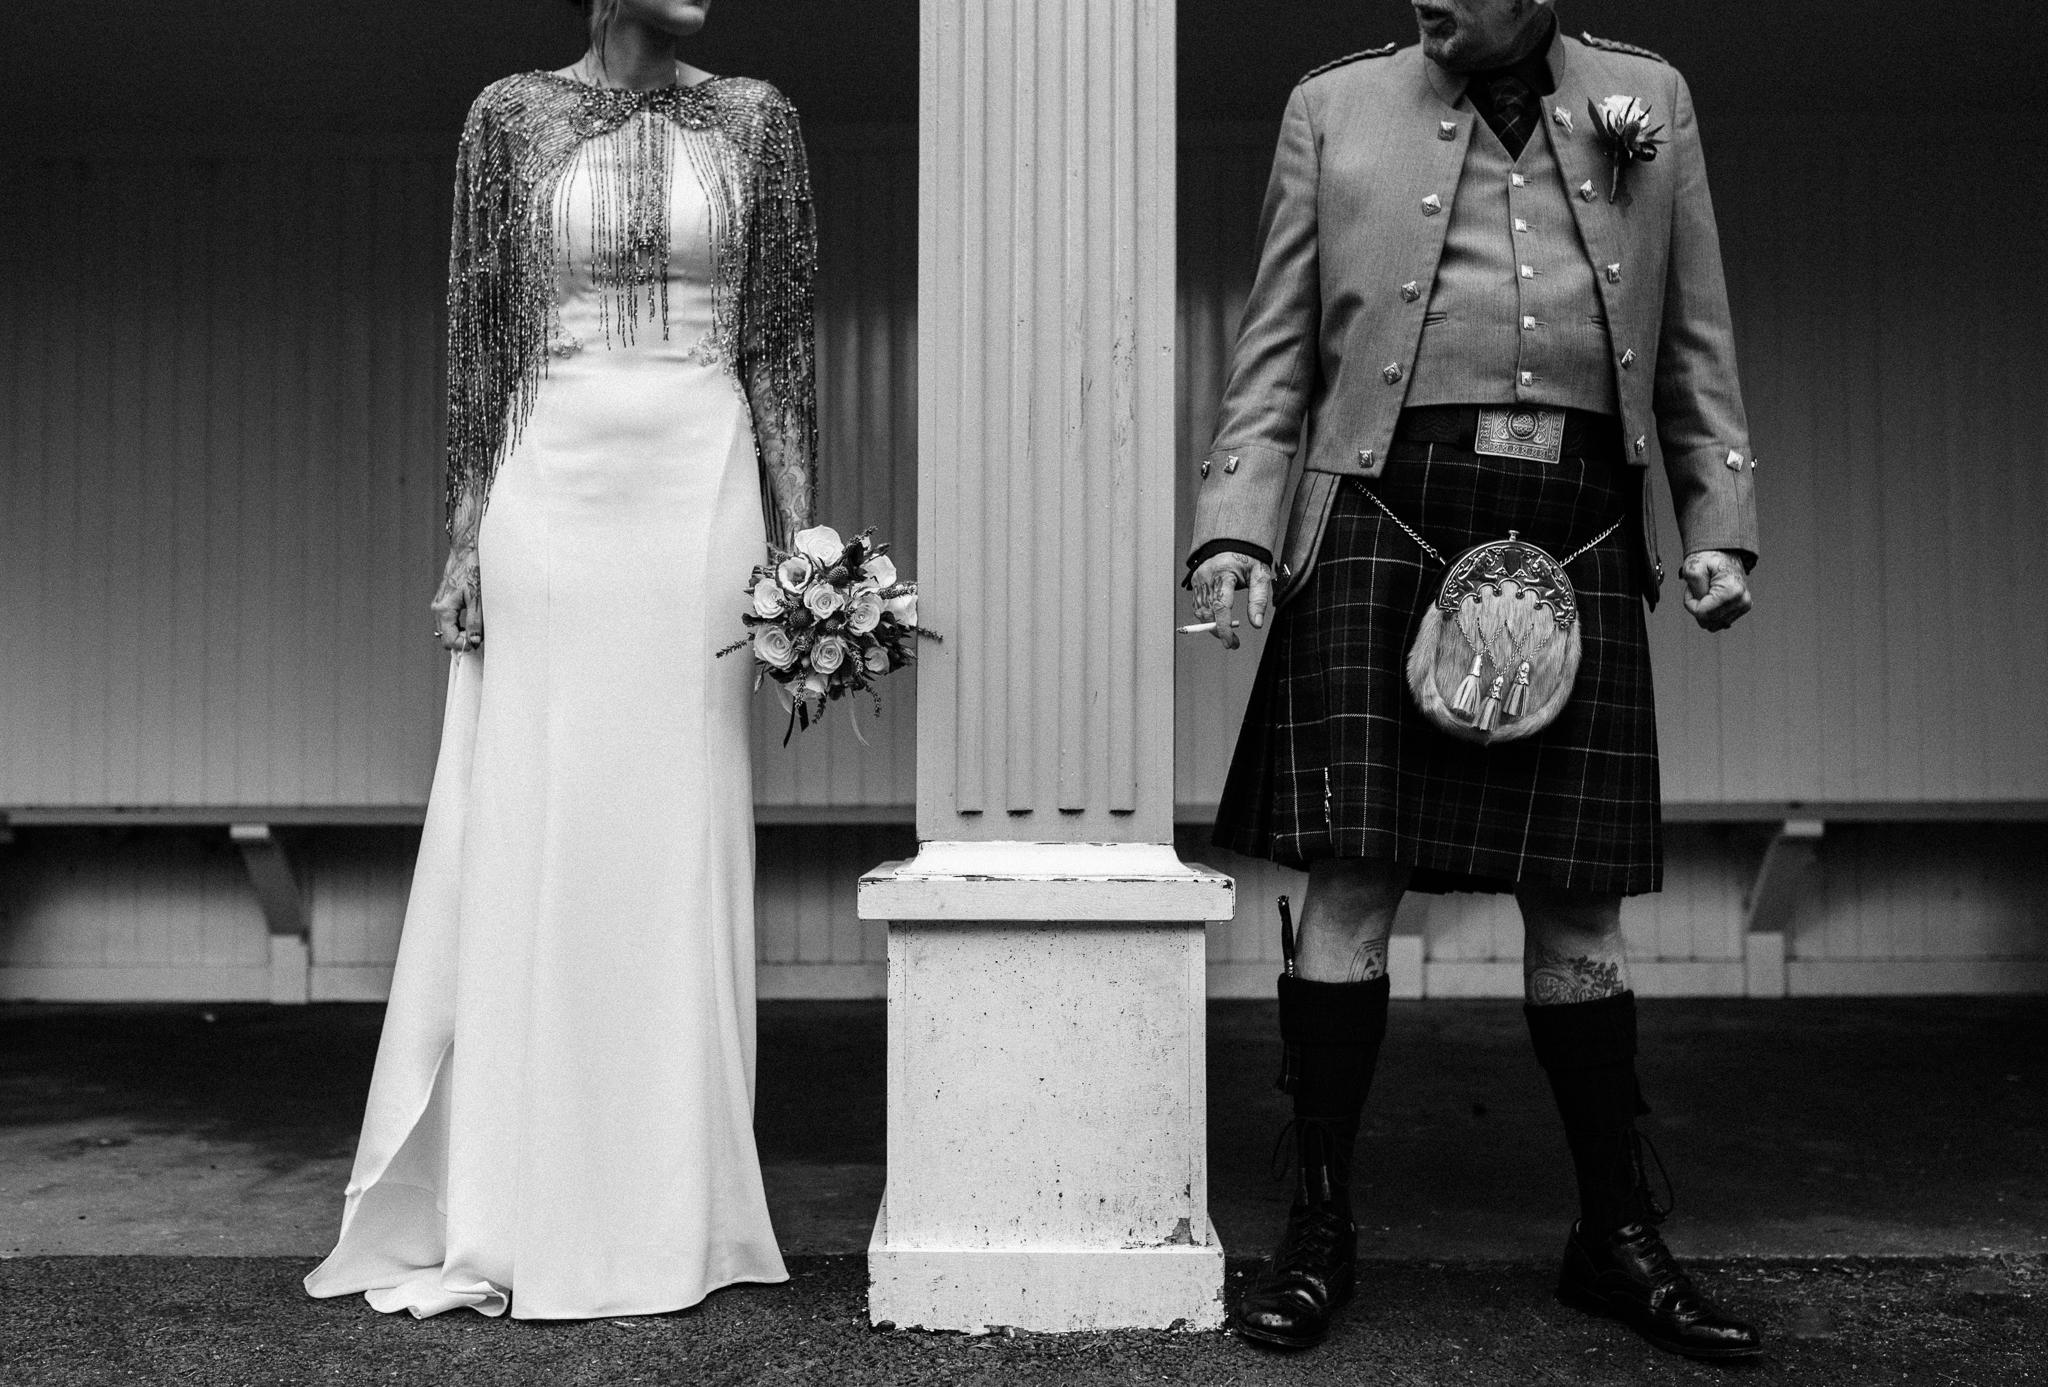 Fiona & Stix - Marischal Collegehttps://www.rocknrollbride.com/2019/07/til-death-do-us-part-skull-themed-tattoo-artists-wedding/